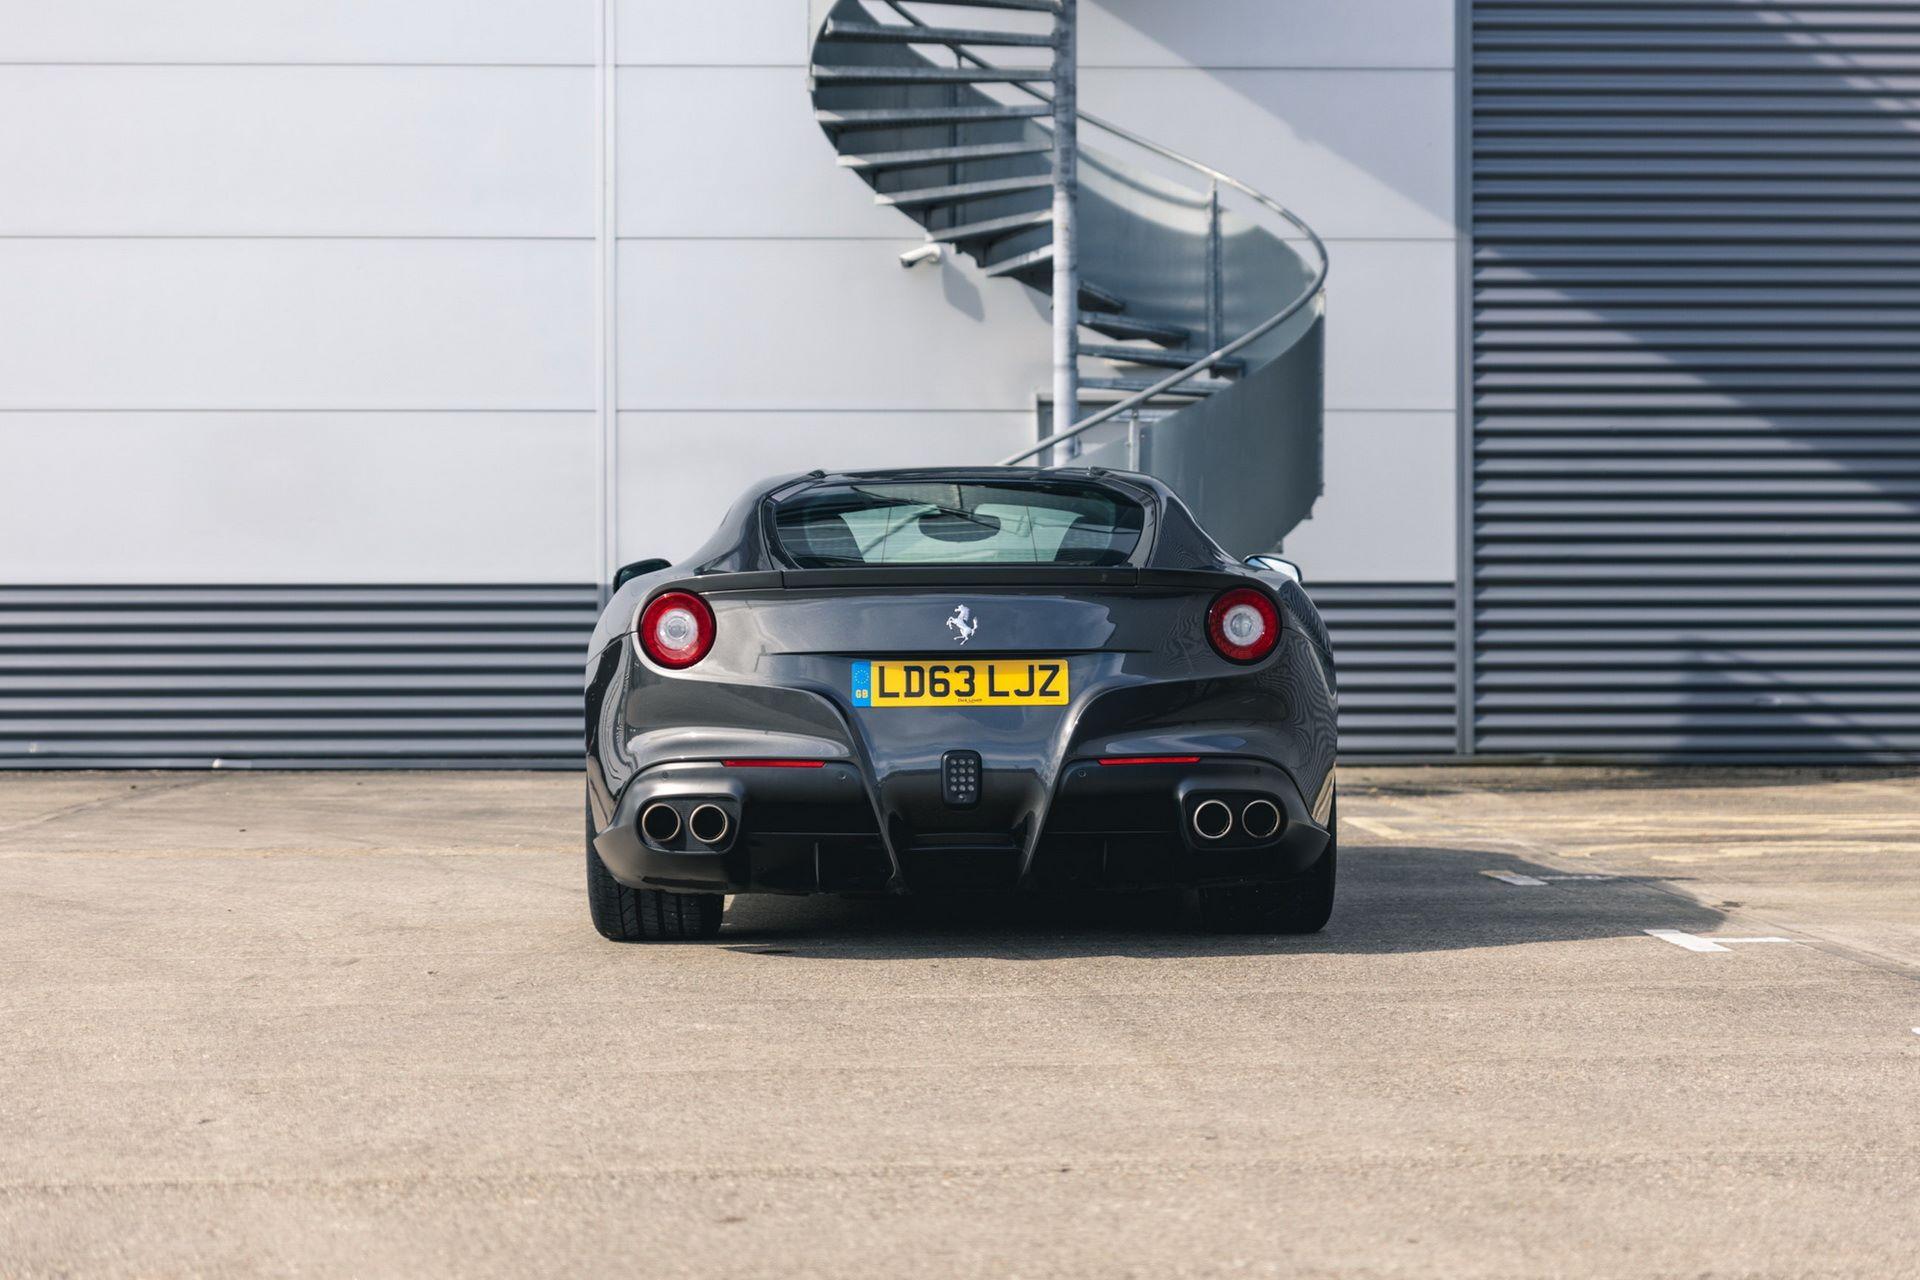 Ferrari-F12berlinetta-Chris-Harris-9